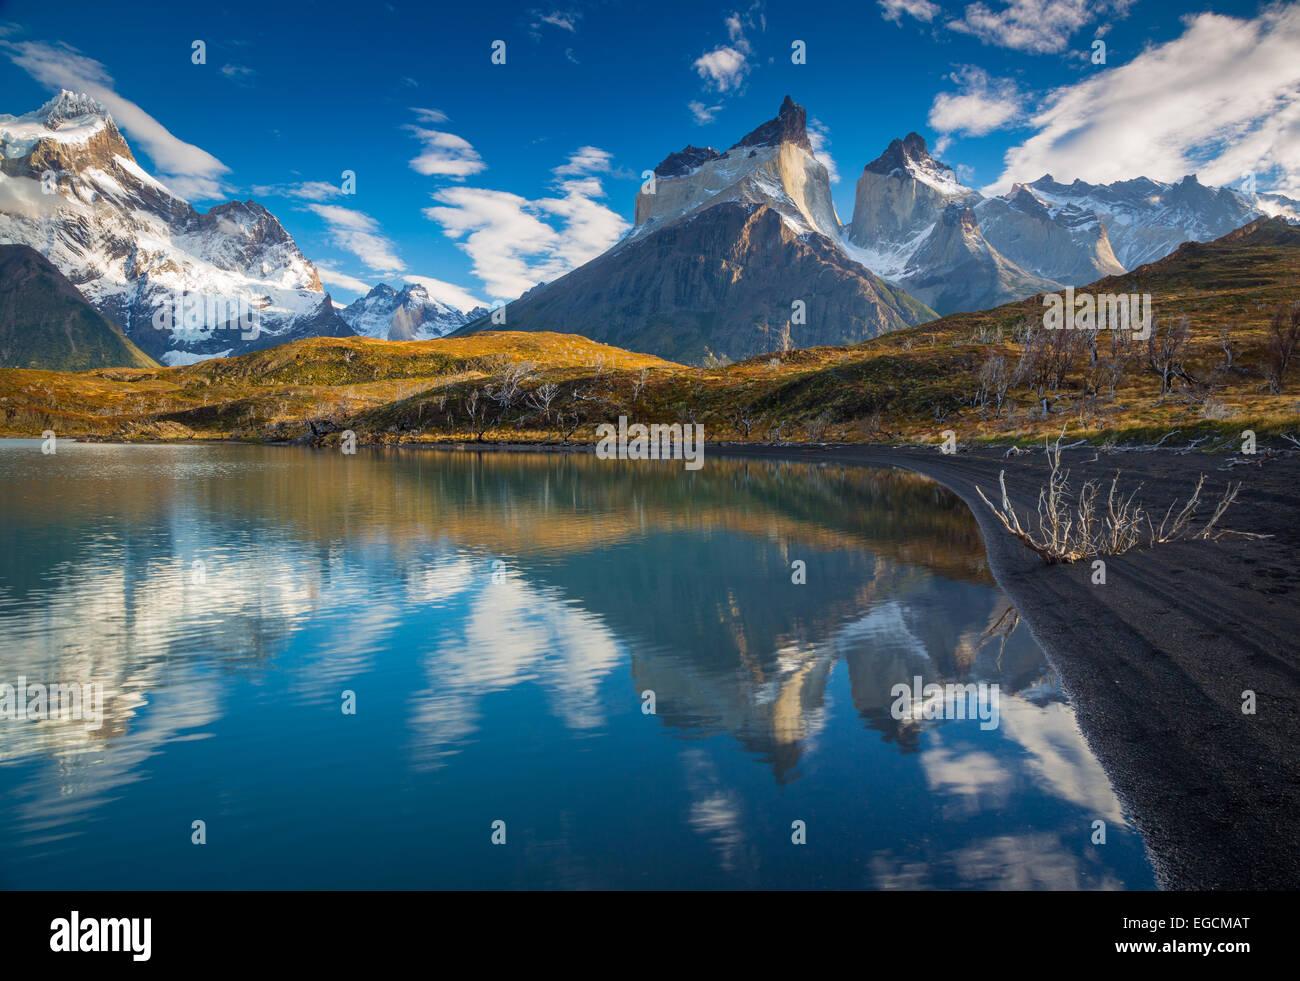 Los Cuernos towering above Lago Nordenskjold, Torres del Paine, Chilean Patagonia - Stock Image